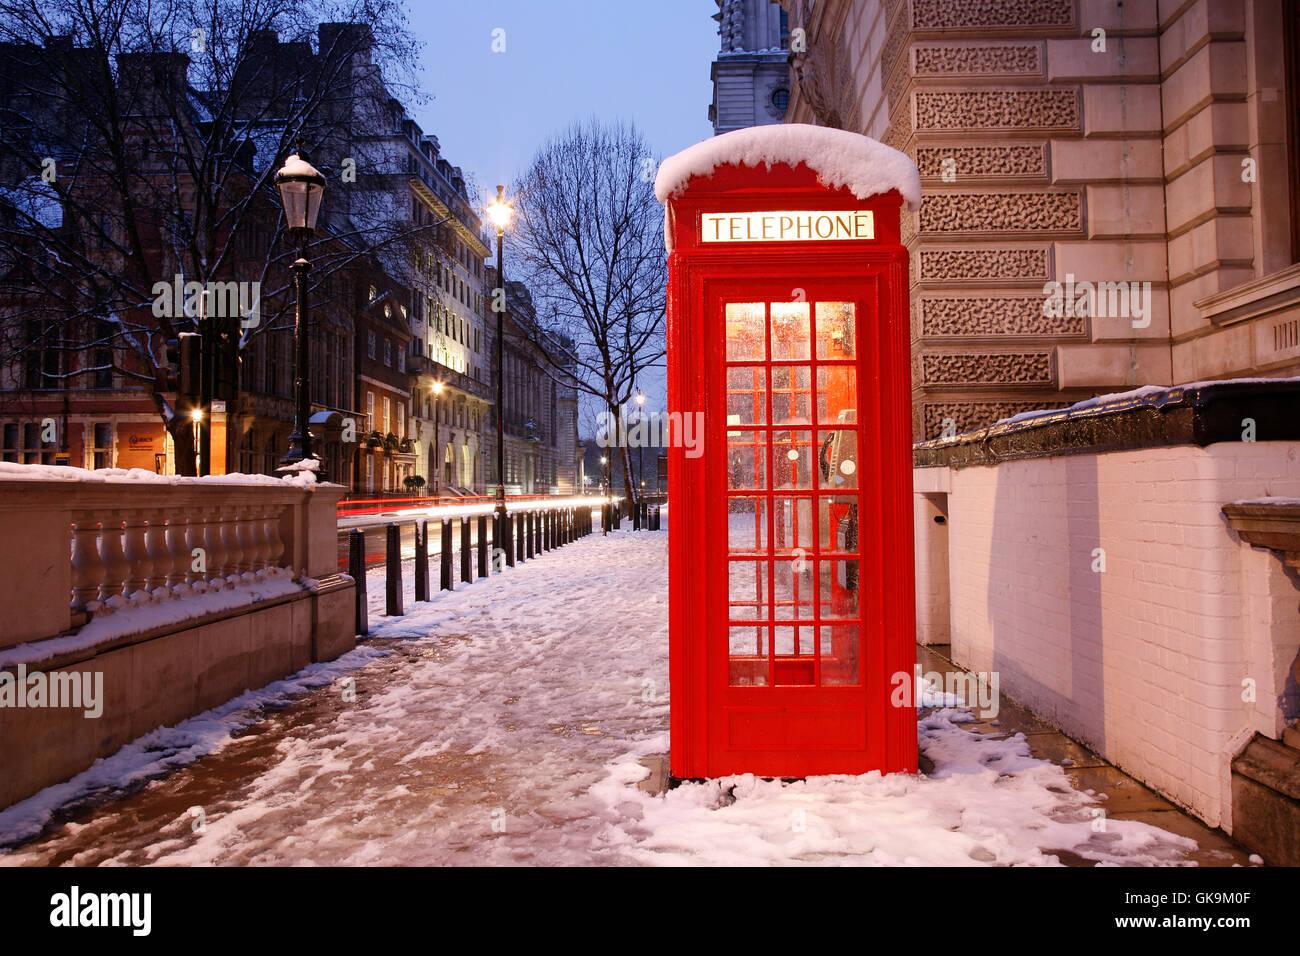 telephone box phonebooth telephone kiosk - Stock Image